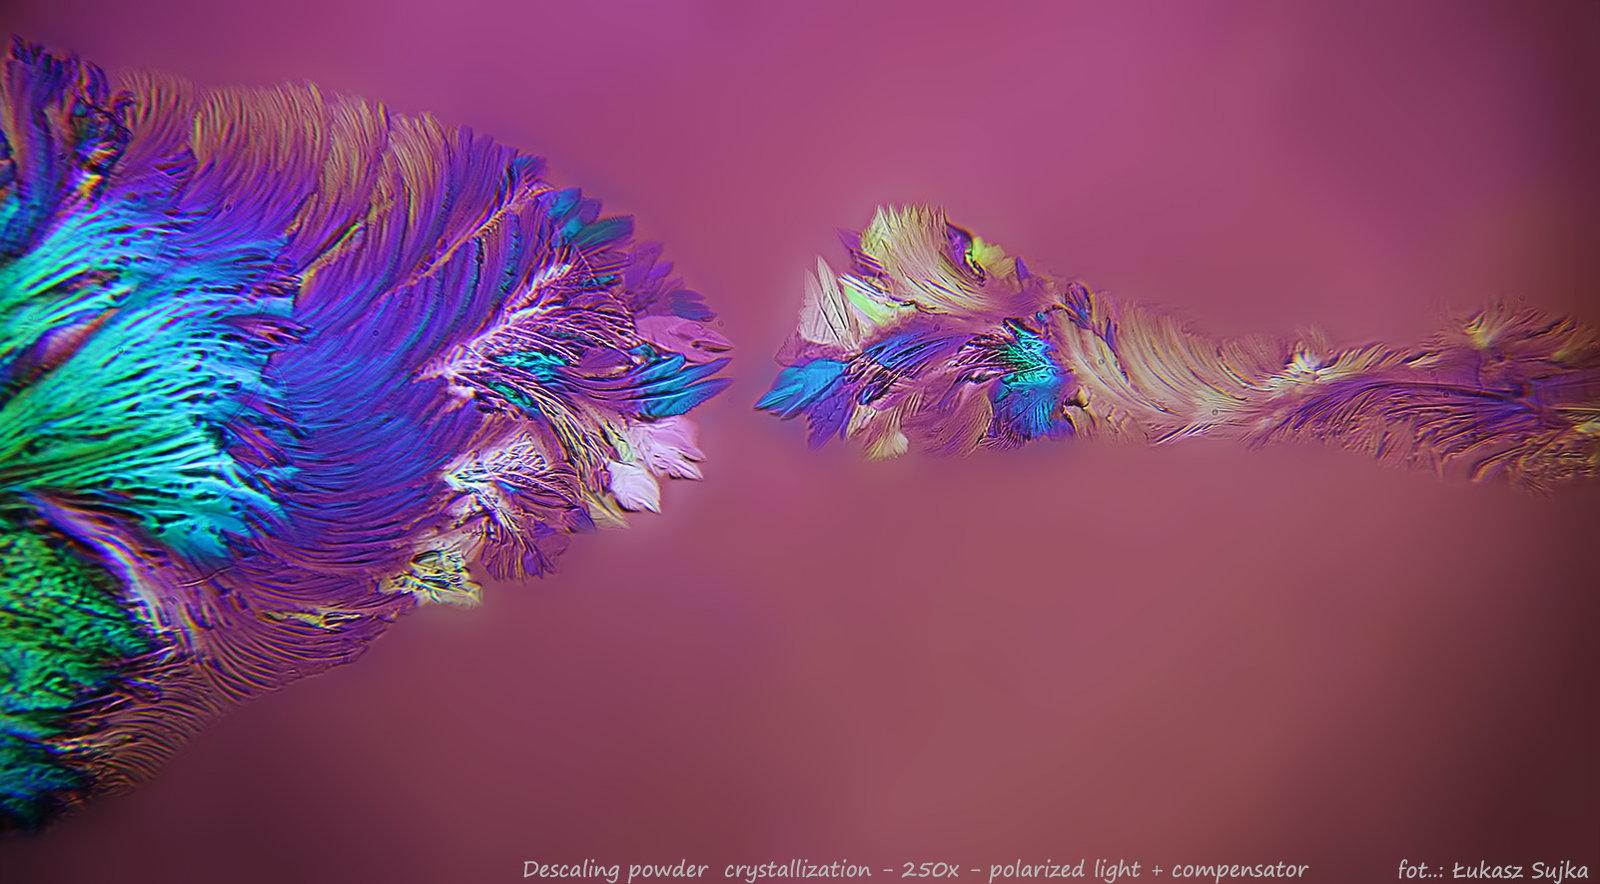 5a74b99e215b8_descalingpolarizedcompenator1.thumb.jpg.a6c1ee5033708c664156e68991f80656.jpg